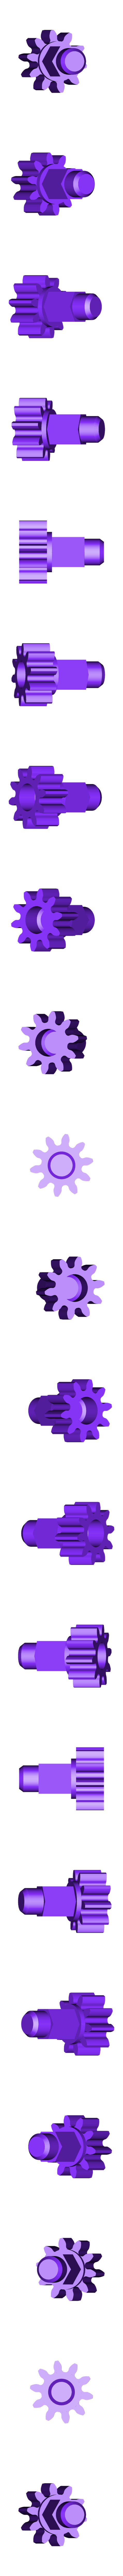 SirHa_Getriebe2.stl Télécharger fichier STL gratuit Air Raid Siren - hand crank version • Plan imprimable en 3D, MlePh